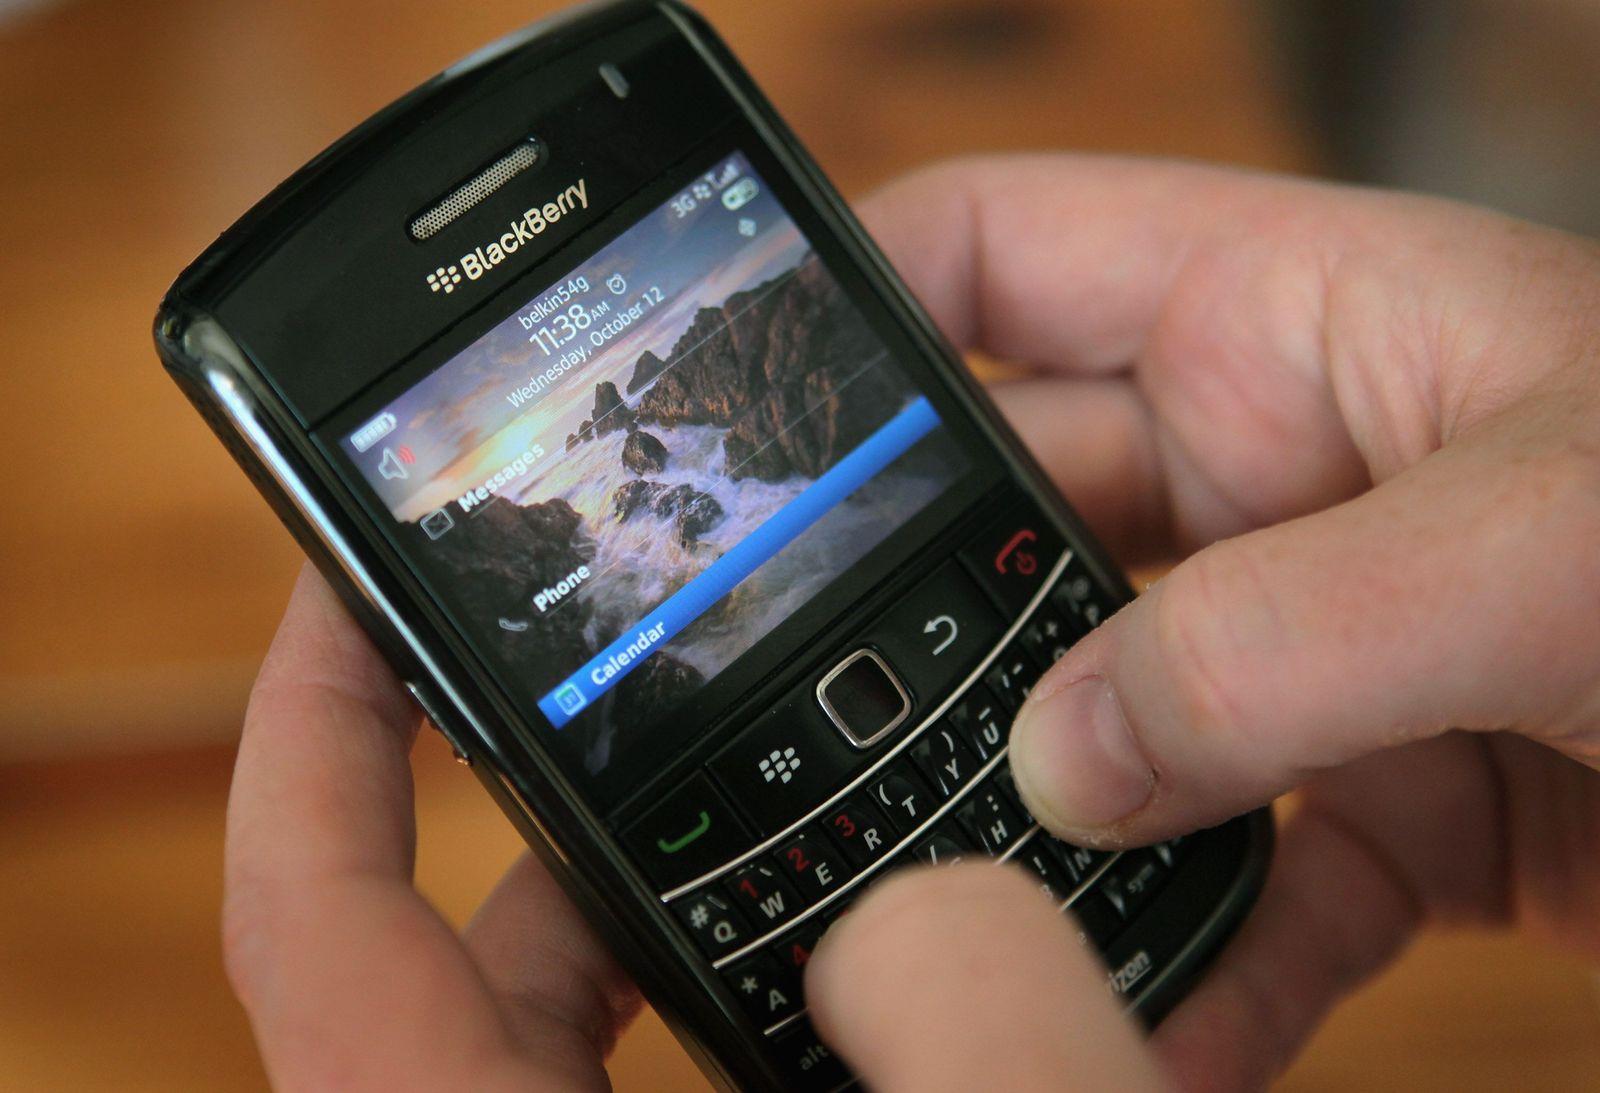 Blackberry / Smartphone